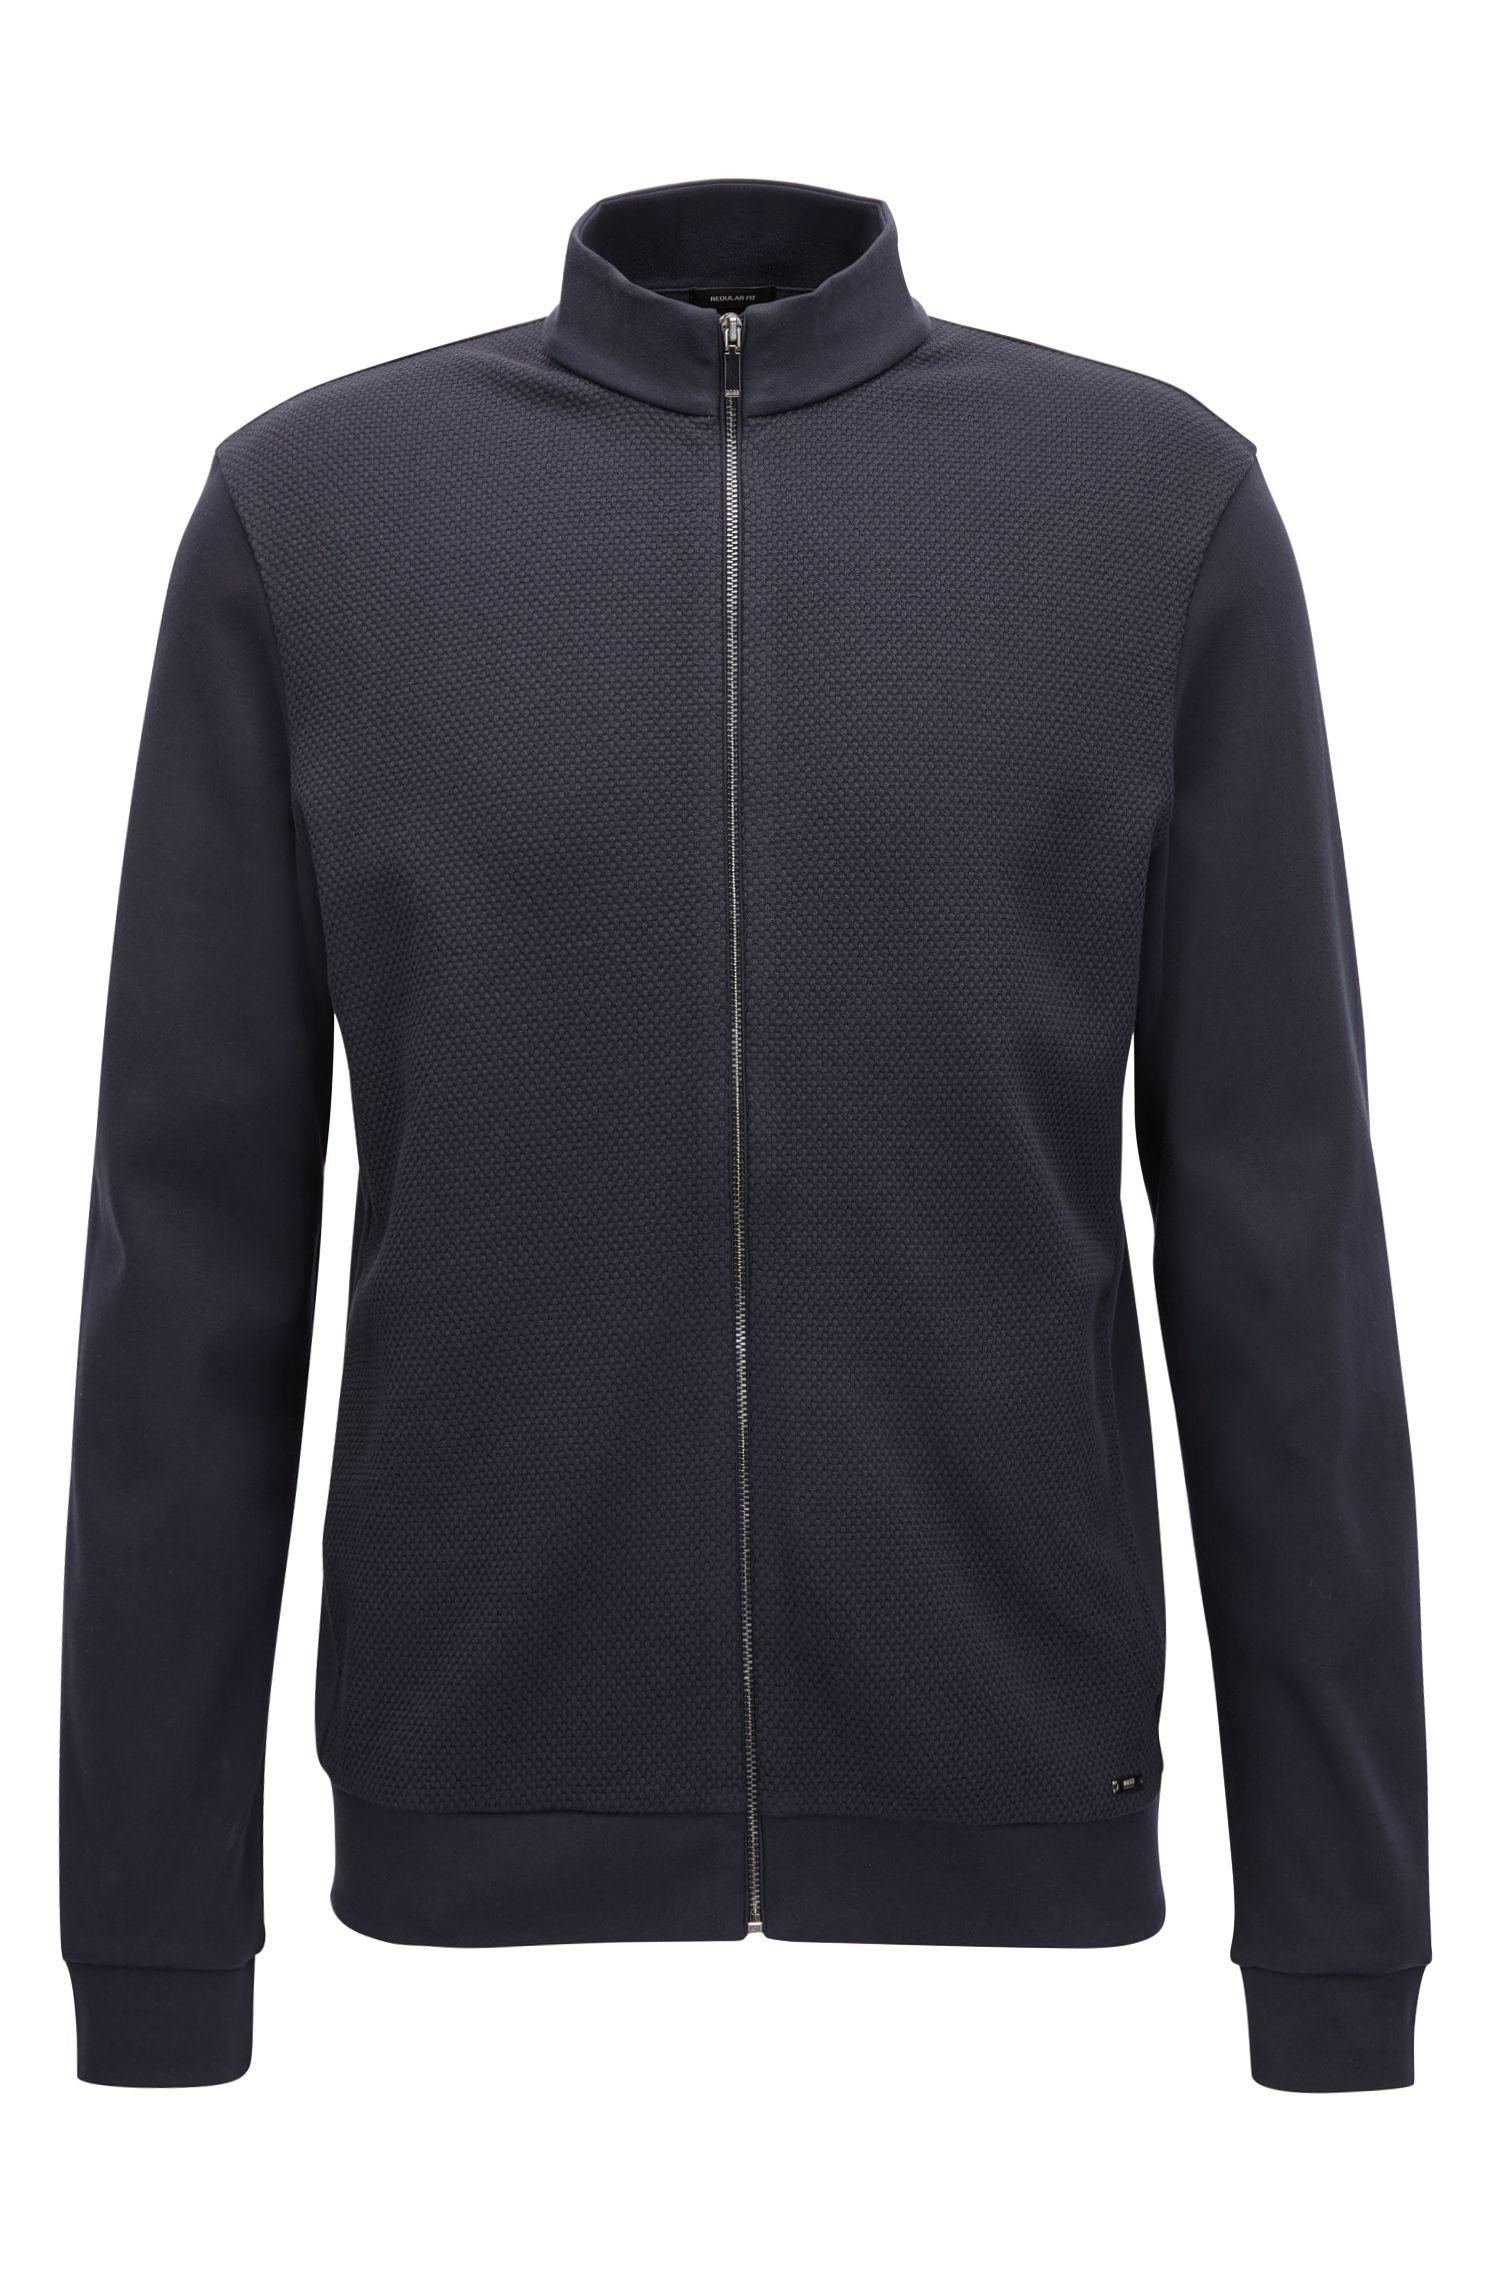 Zip-through sweatshirt in mercerised cotton terry